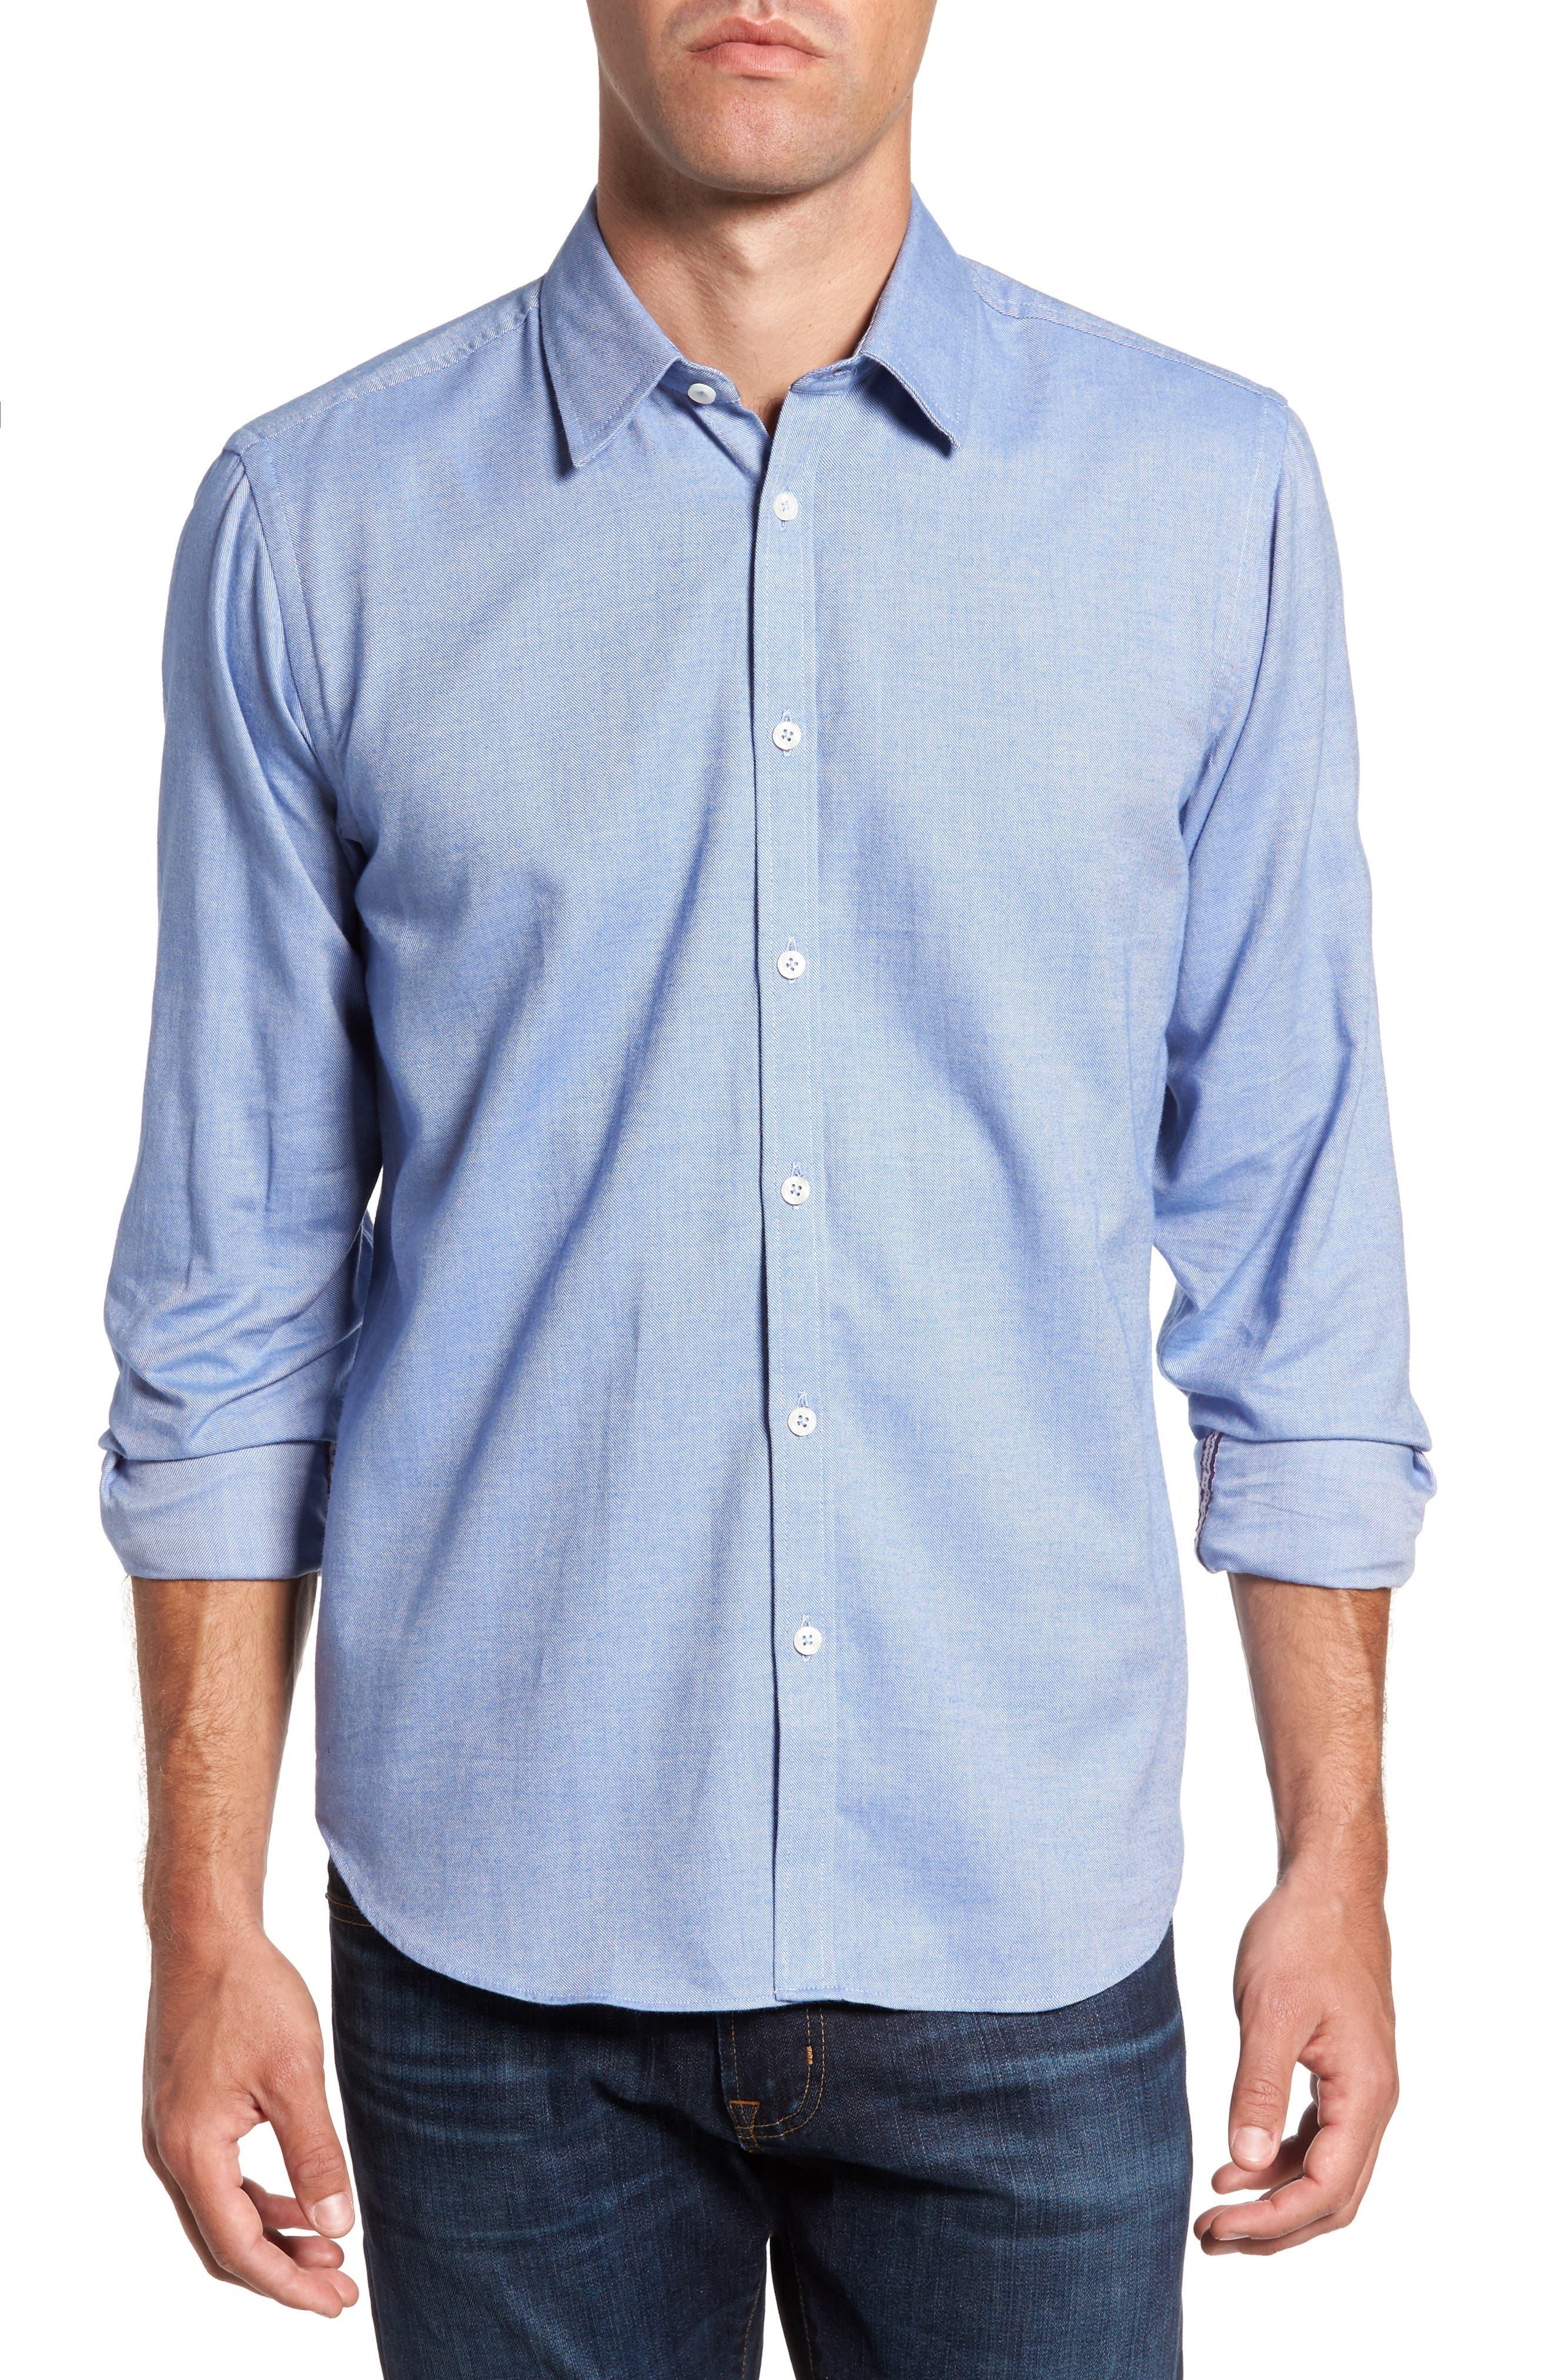 Alternate Image 1 Selected - Jeremy Argyle Slim Fit Oxford Cloth Sport Shirt